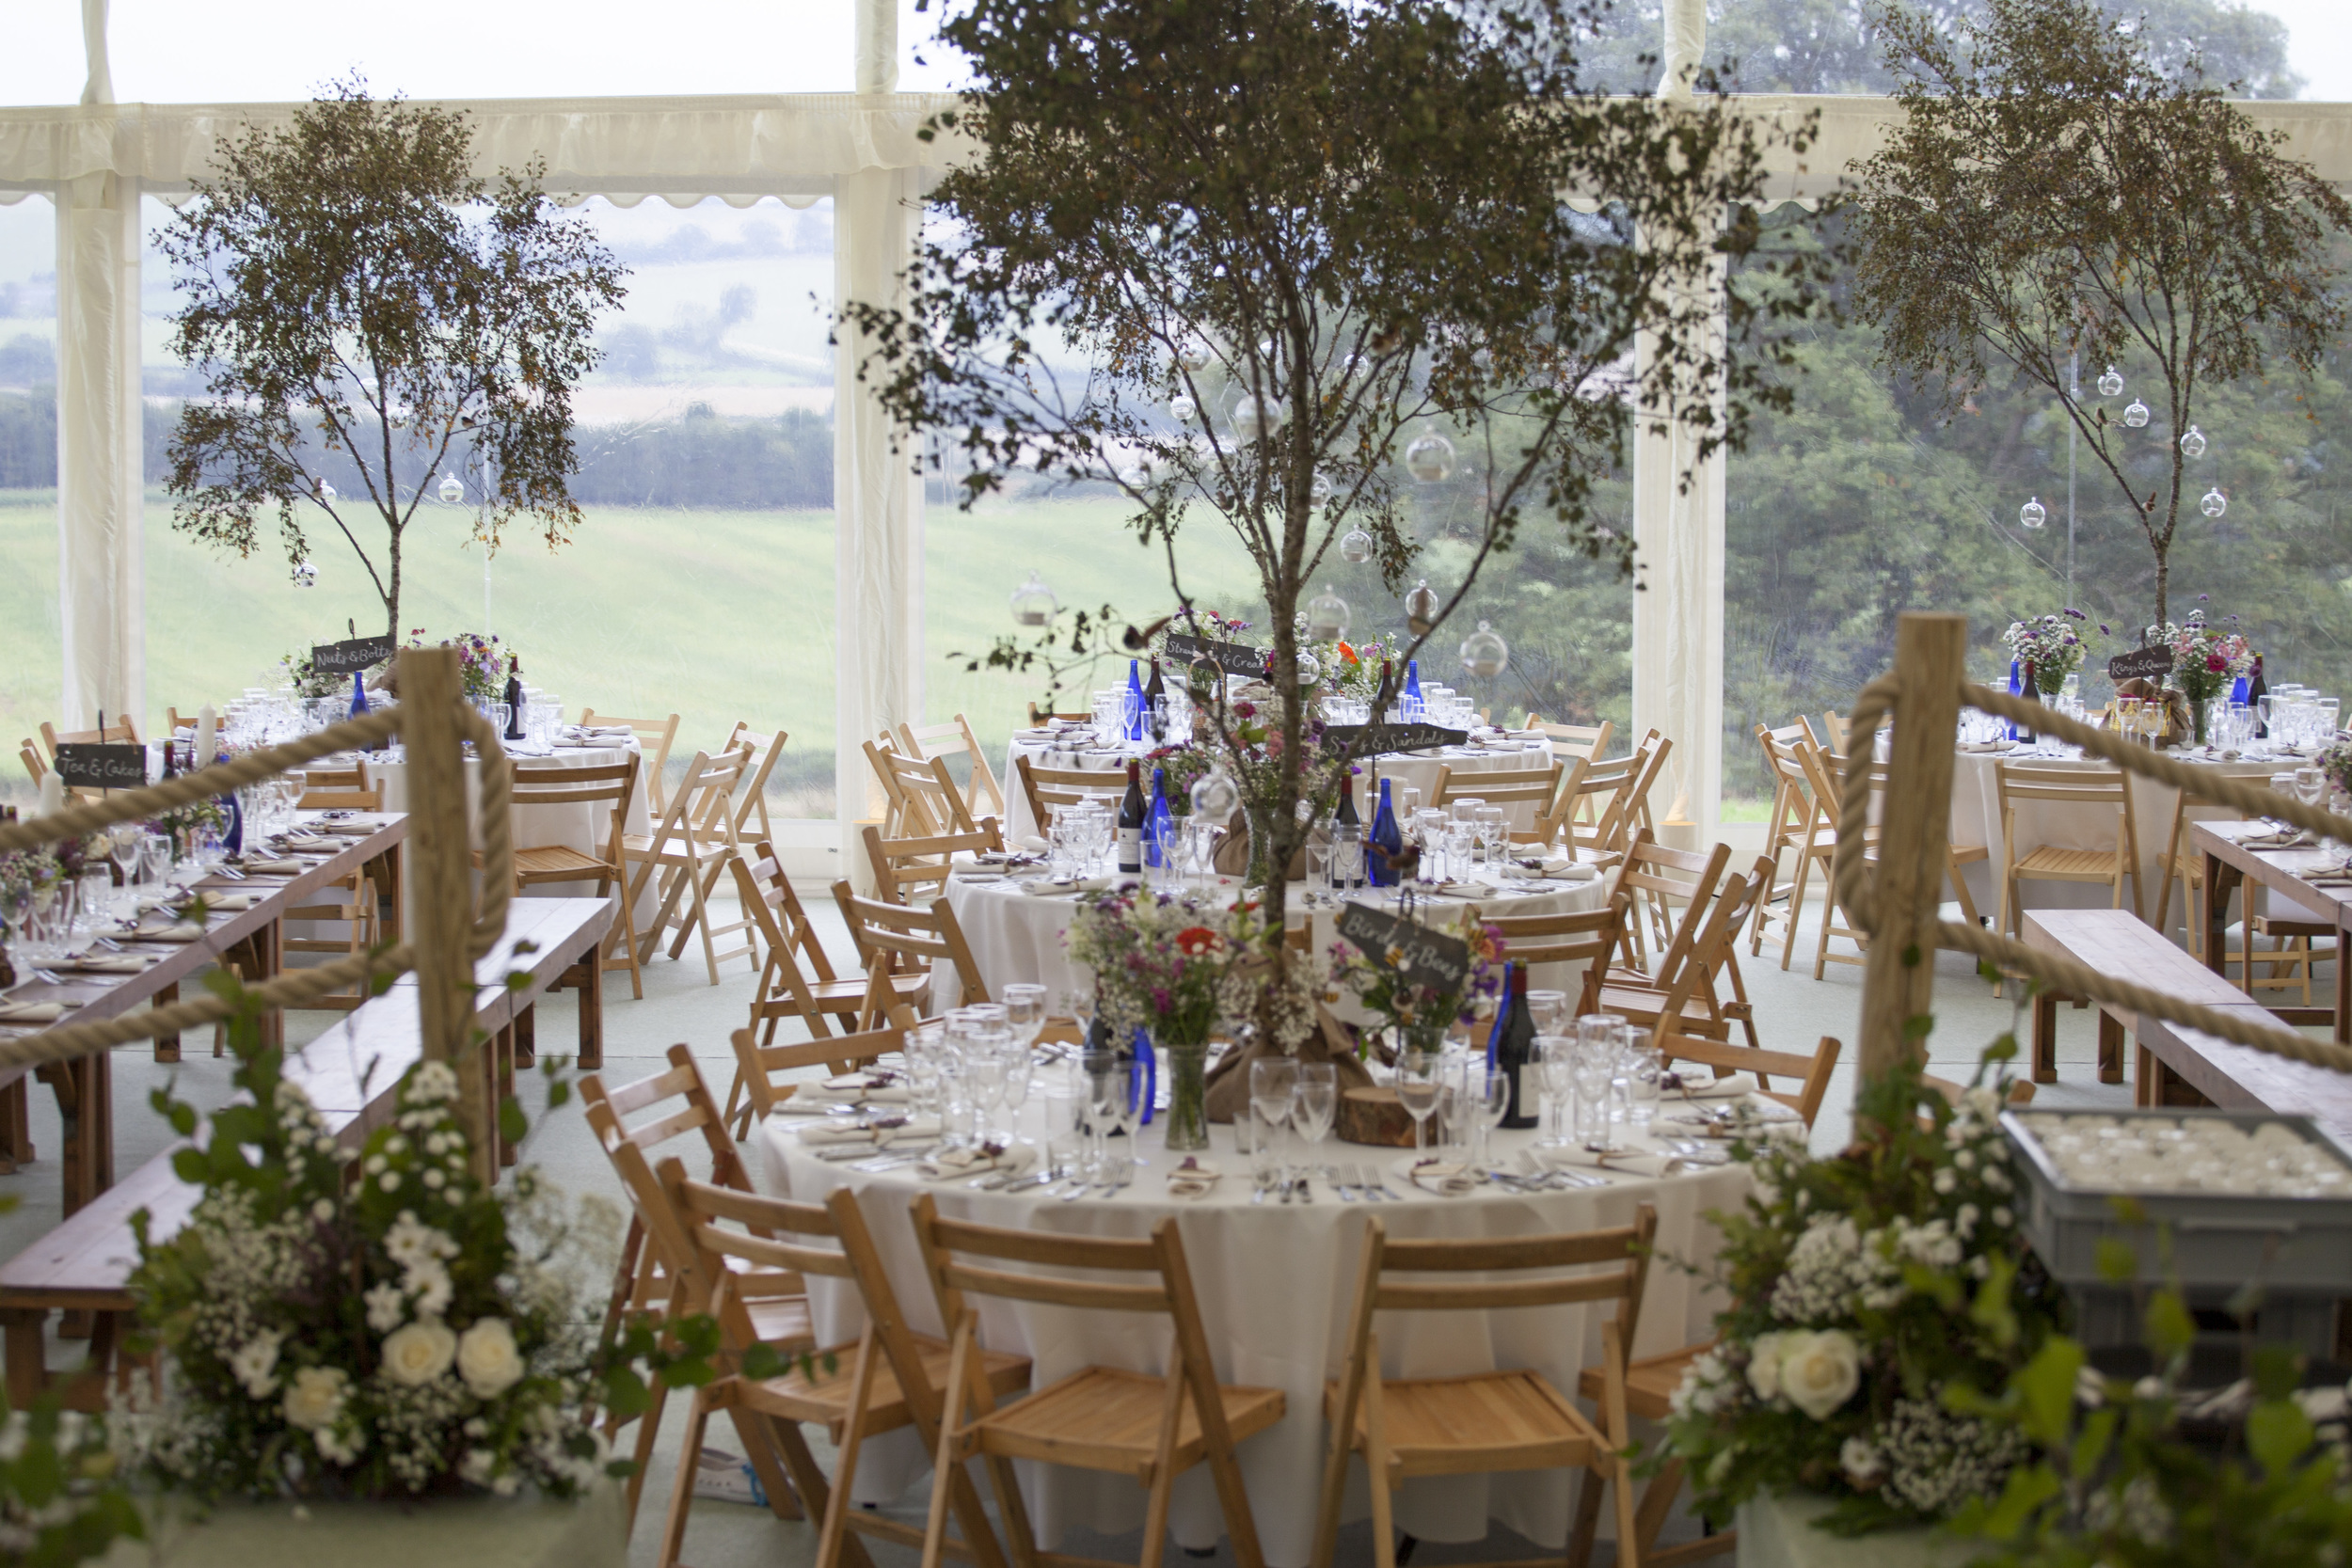 B-Sophie-Ralph-Shropshire-Wedding-Edit_36.jpg